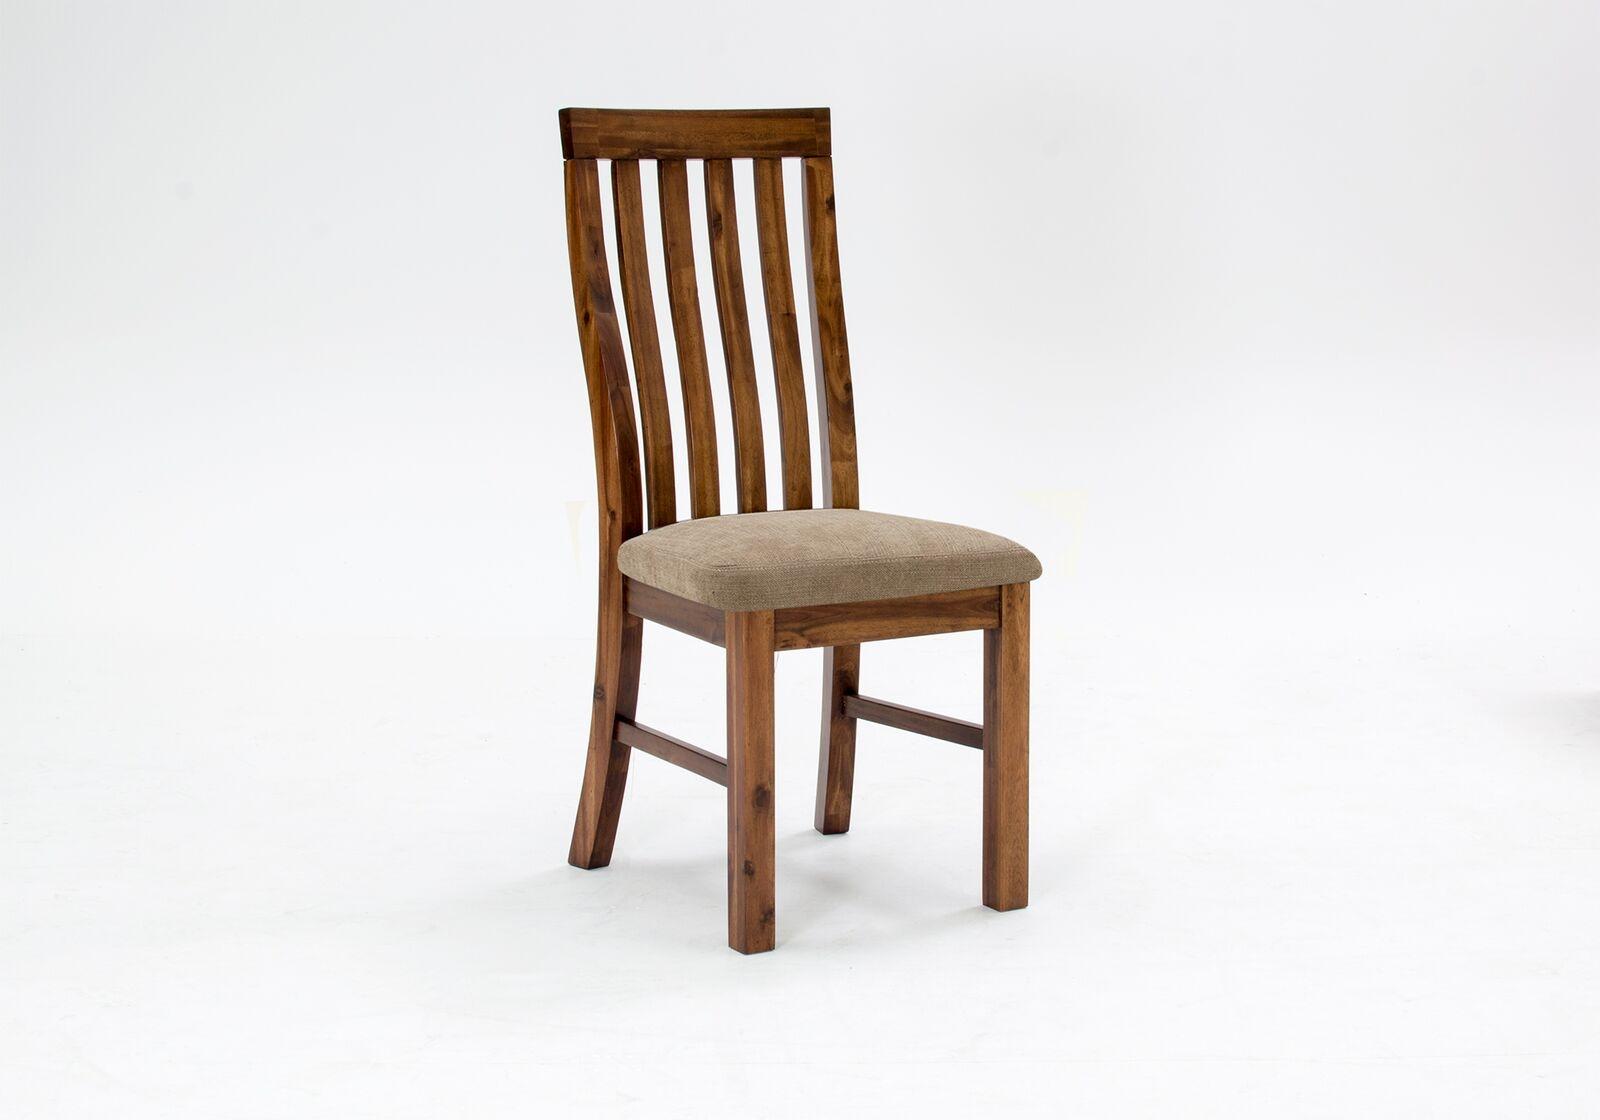 Scaun din lemn de salcam cu sezut tapitat cu stofa Emerson Brown l42xA50xH104 cm